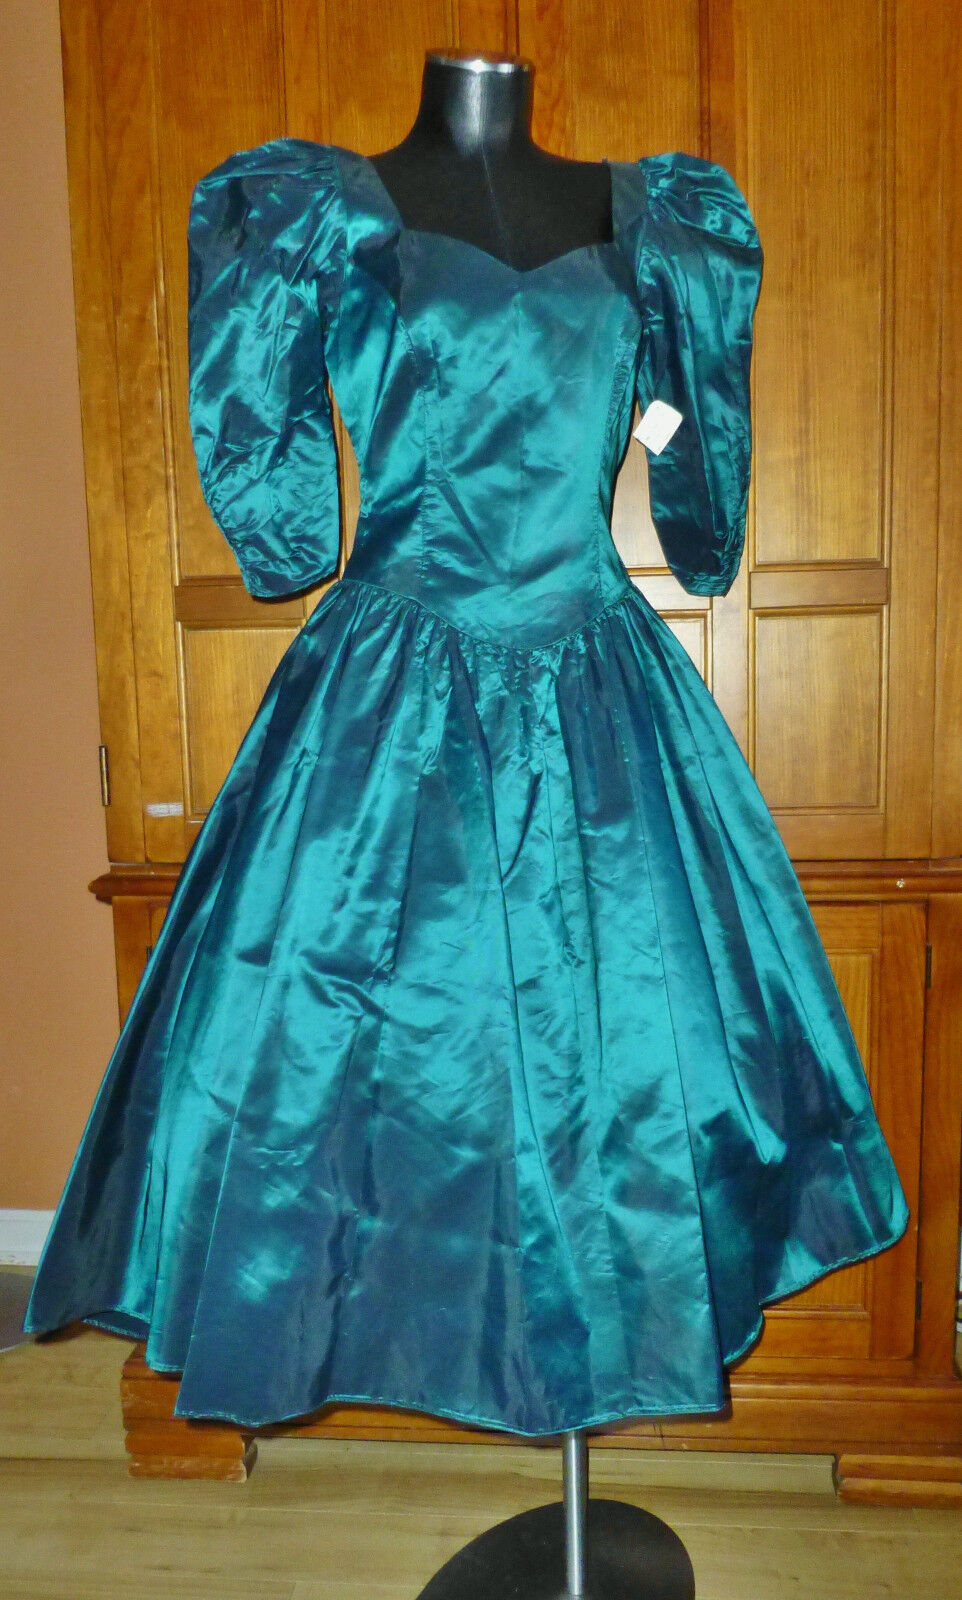 NEW wTAG Vtg 80s Alfred Angelo Crisp Taffeta Green Bow Formal Evening DRESS GOWN